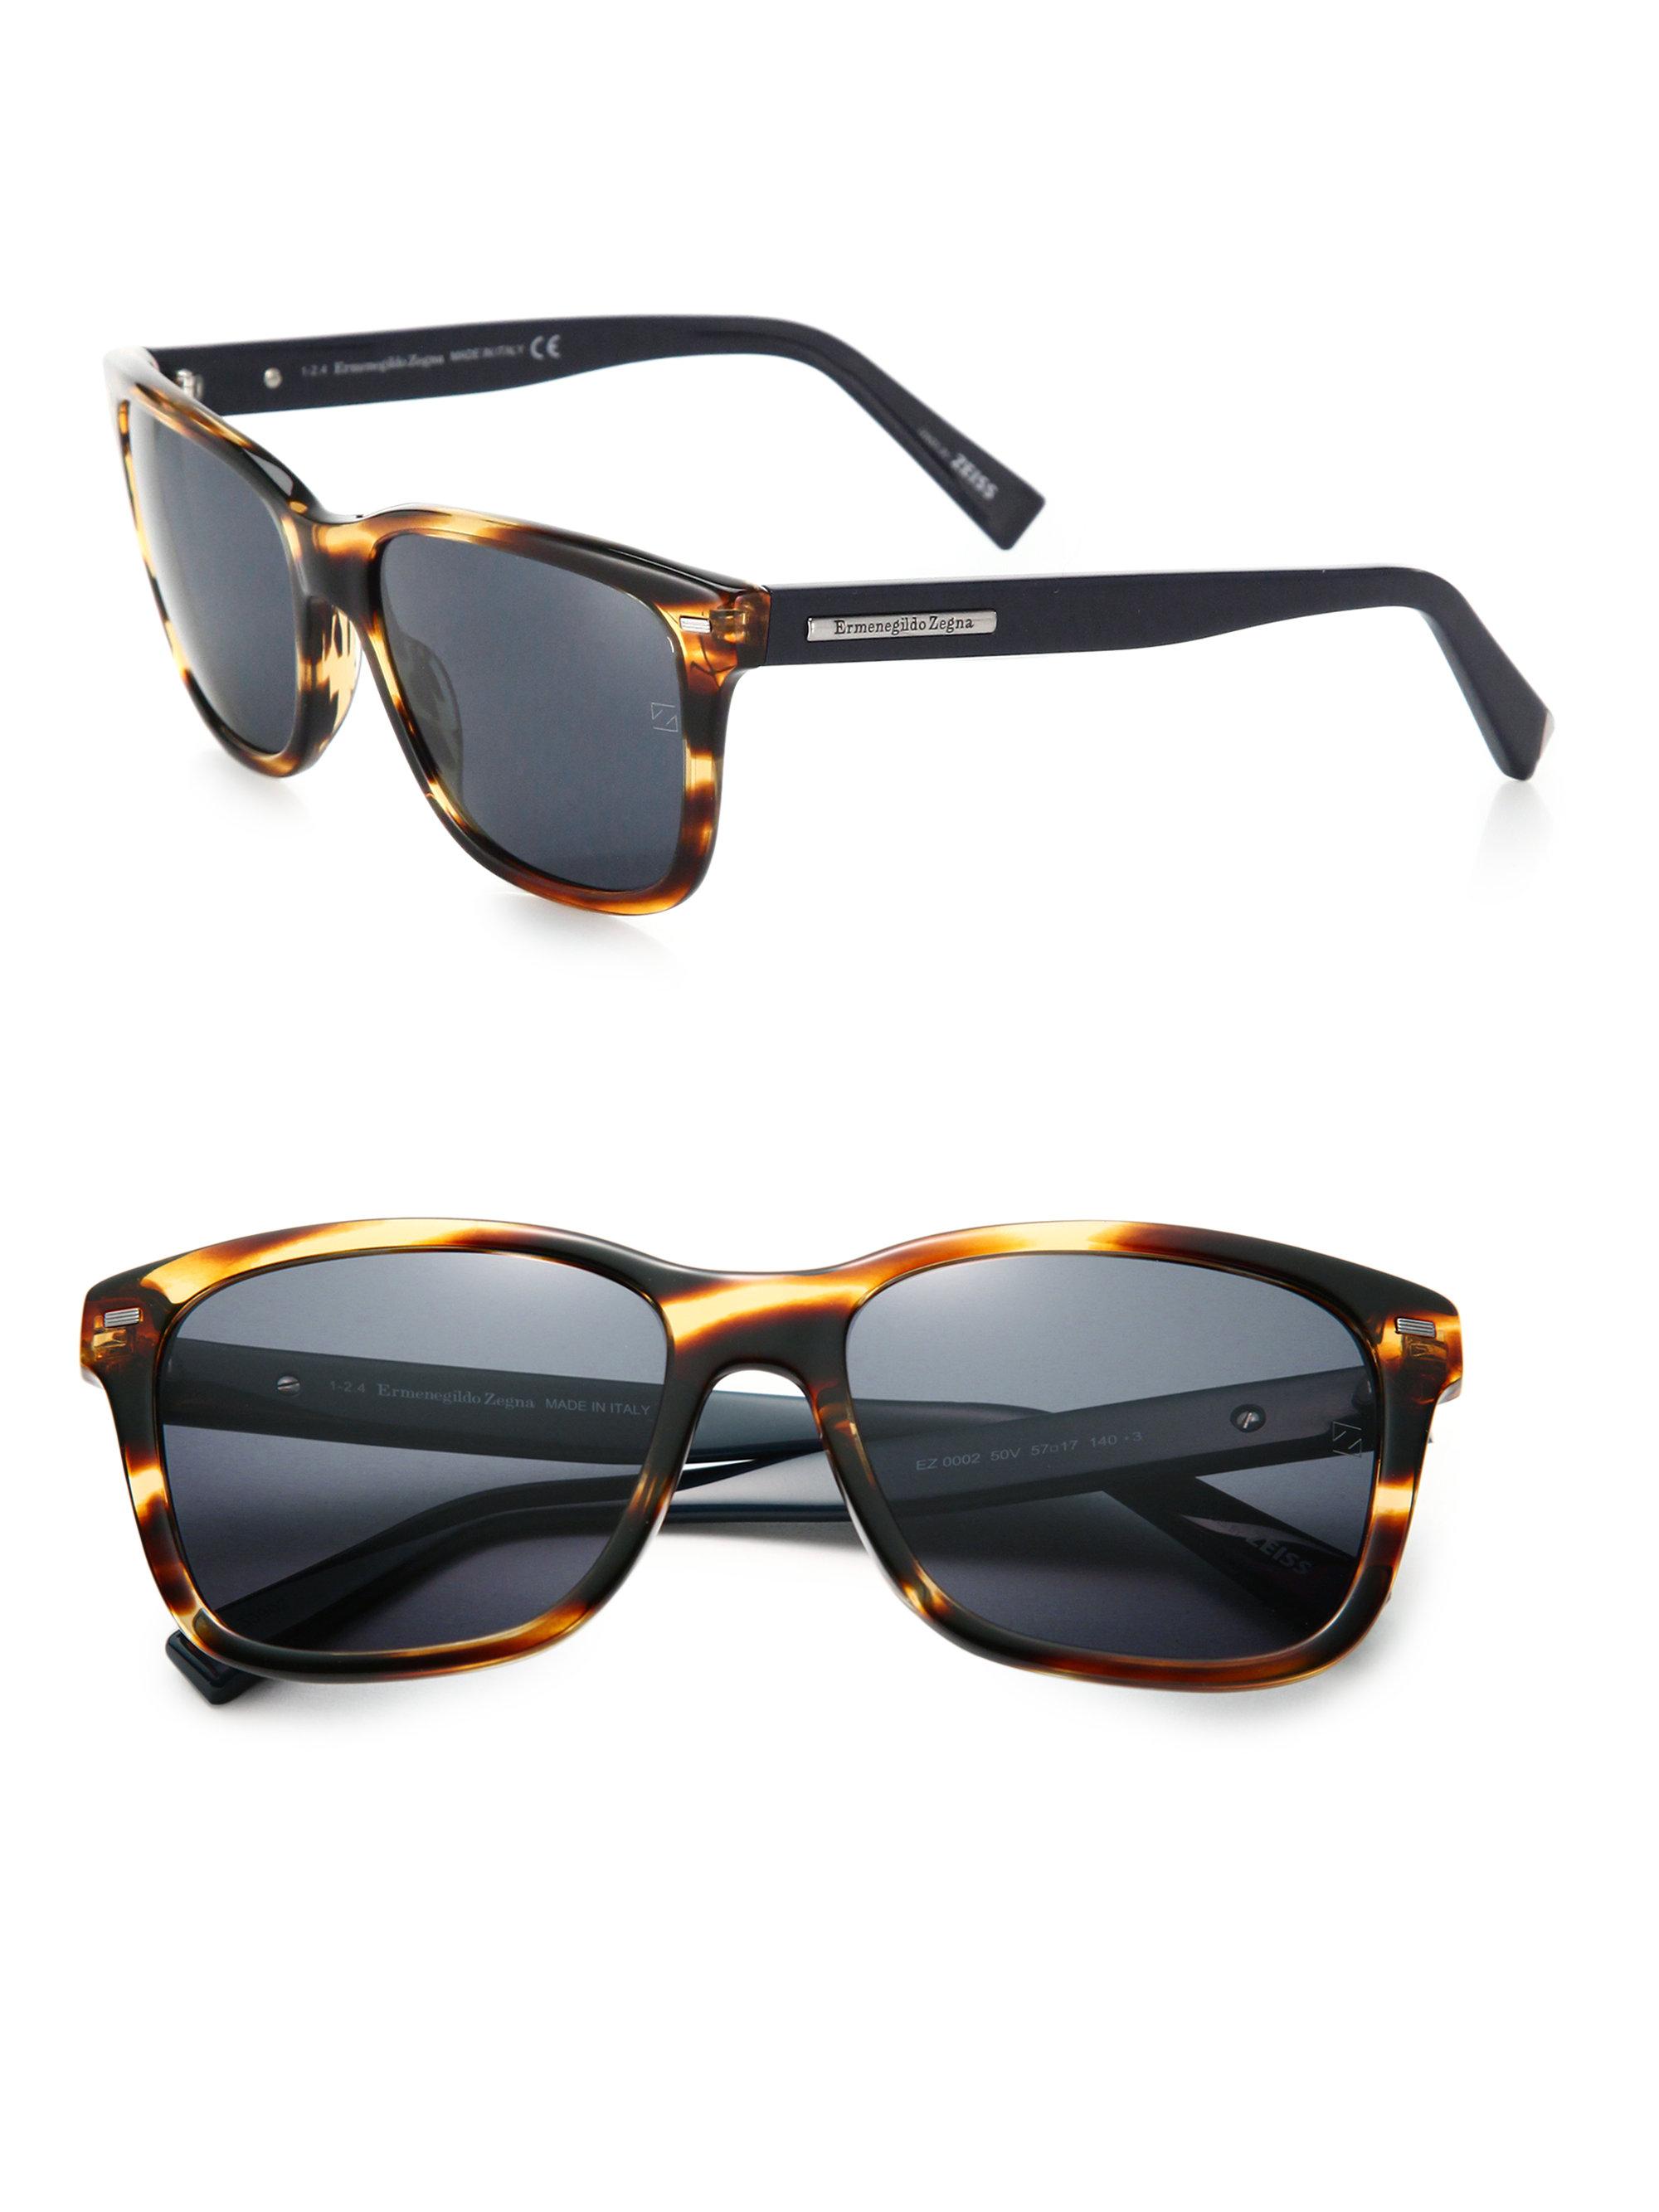 5407e8b5d1 Zegna Sunglasses